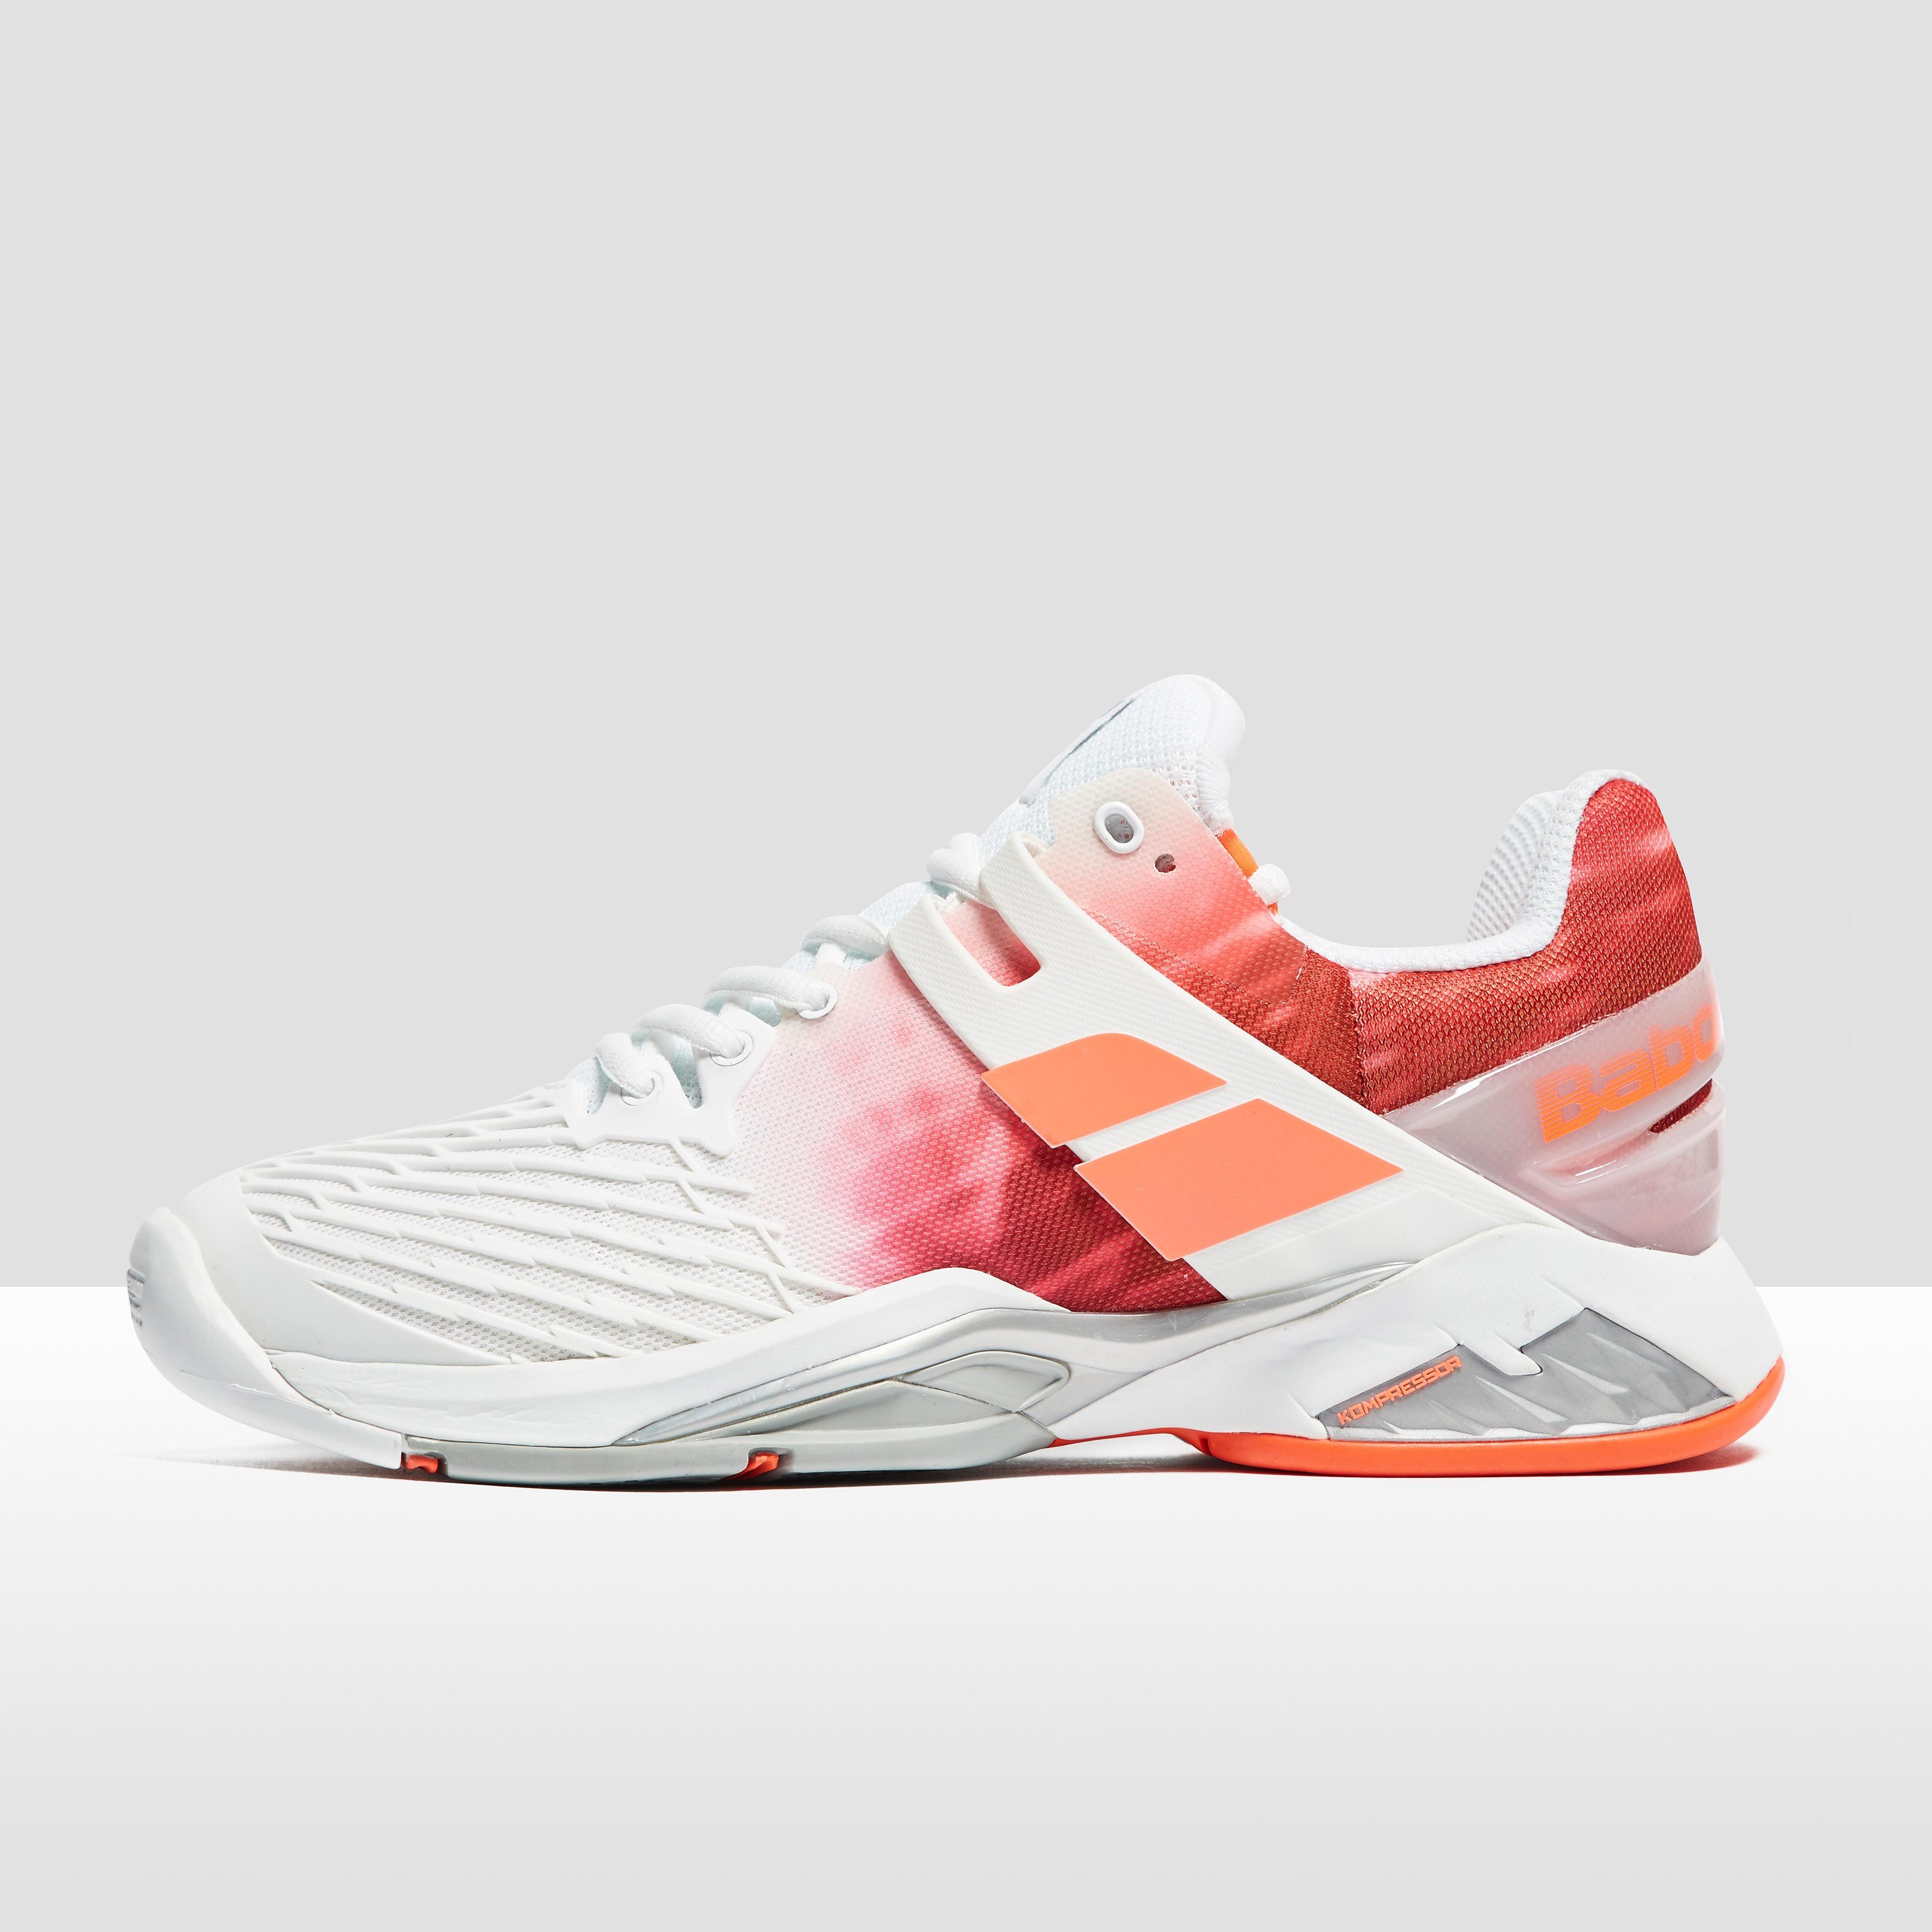 Babolat Propulse Fury Women's Tennis Shoes